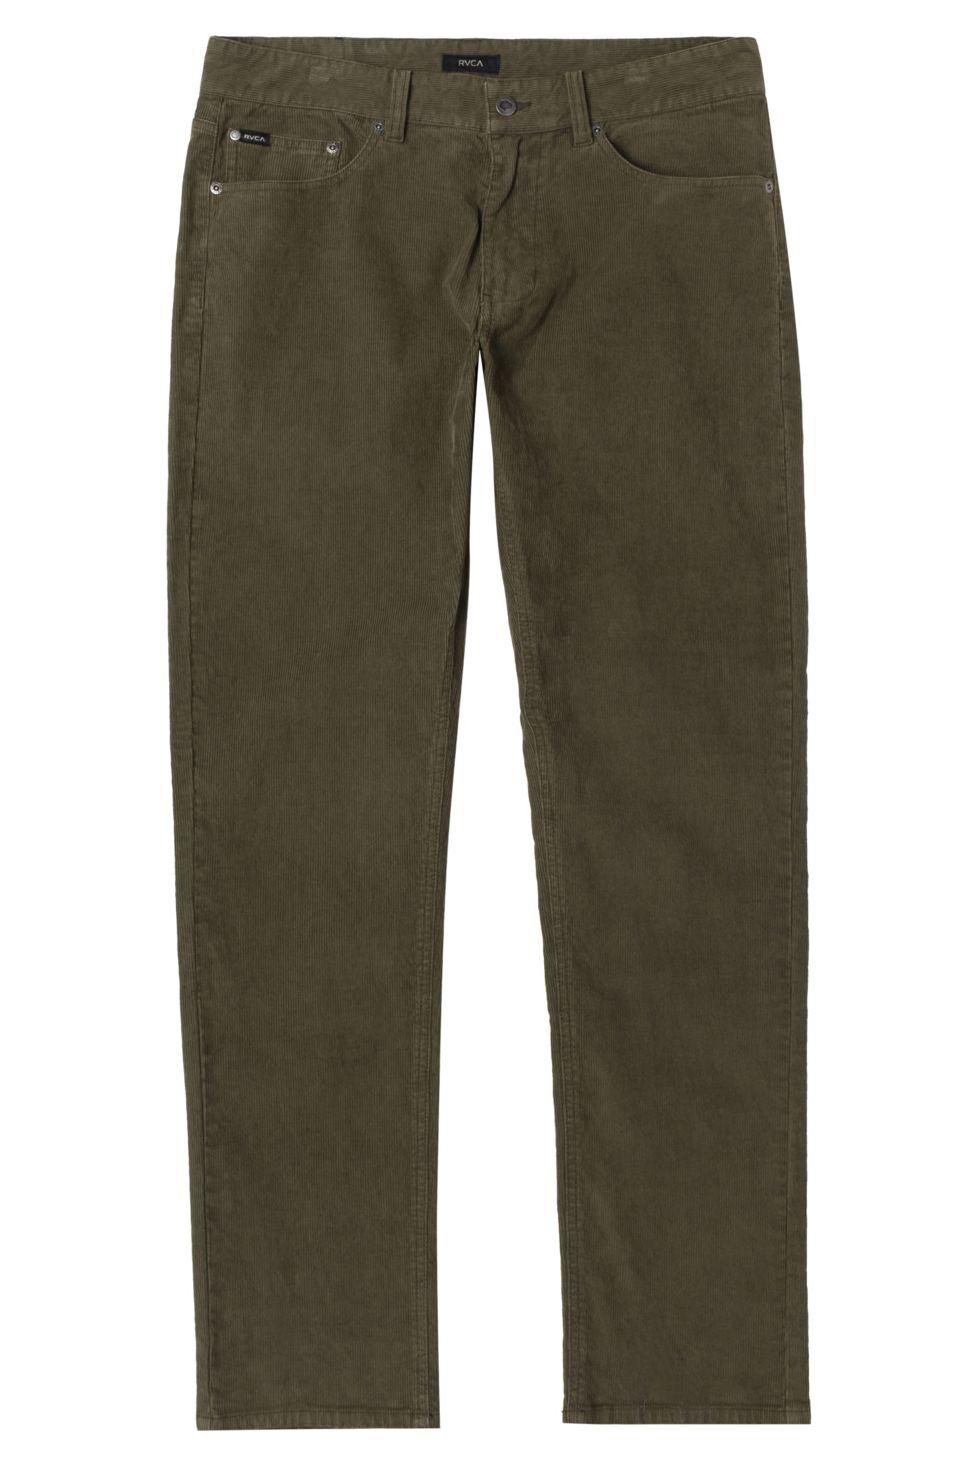 RVCA Pants DAGGERS PIGMENT CORD Olive